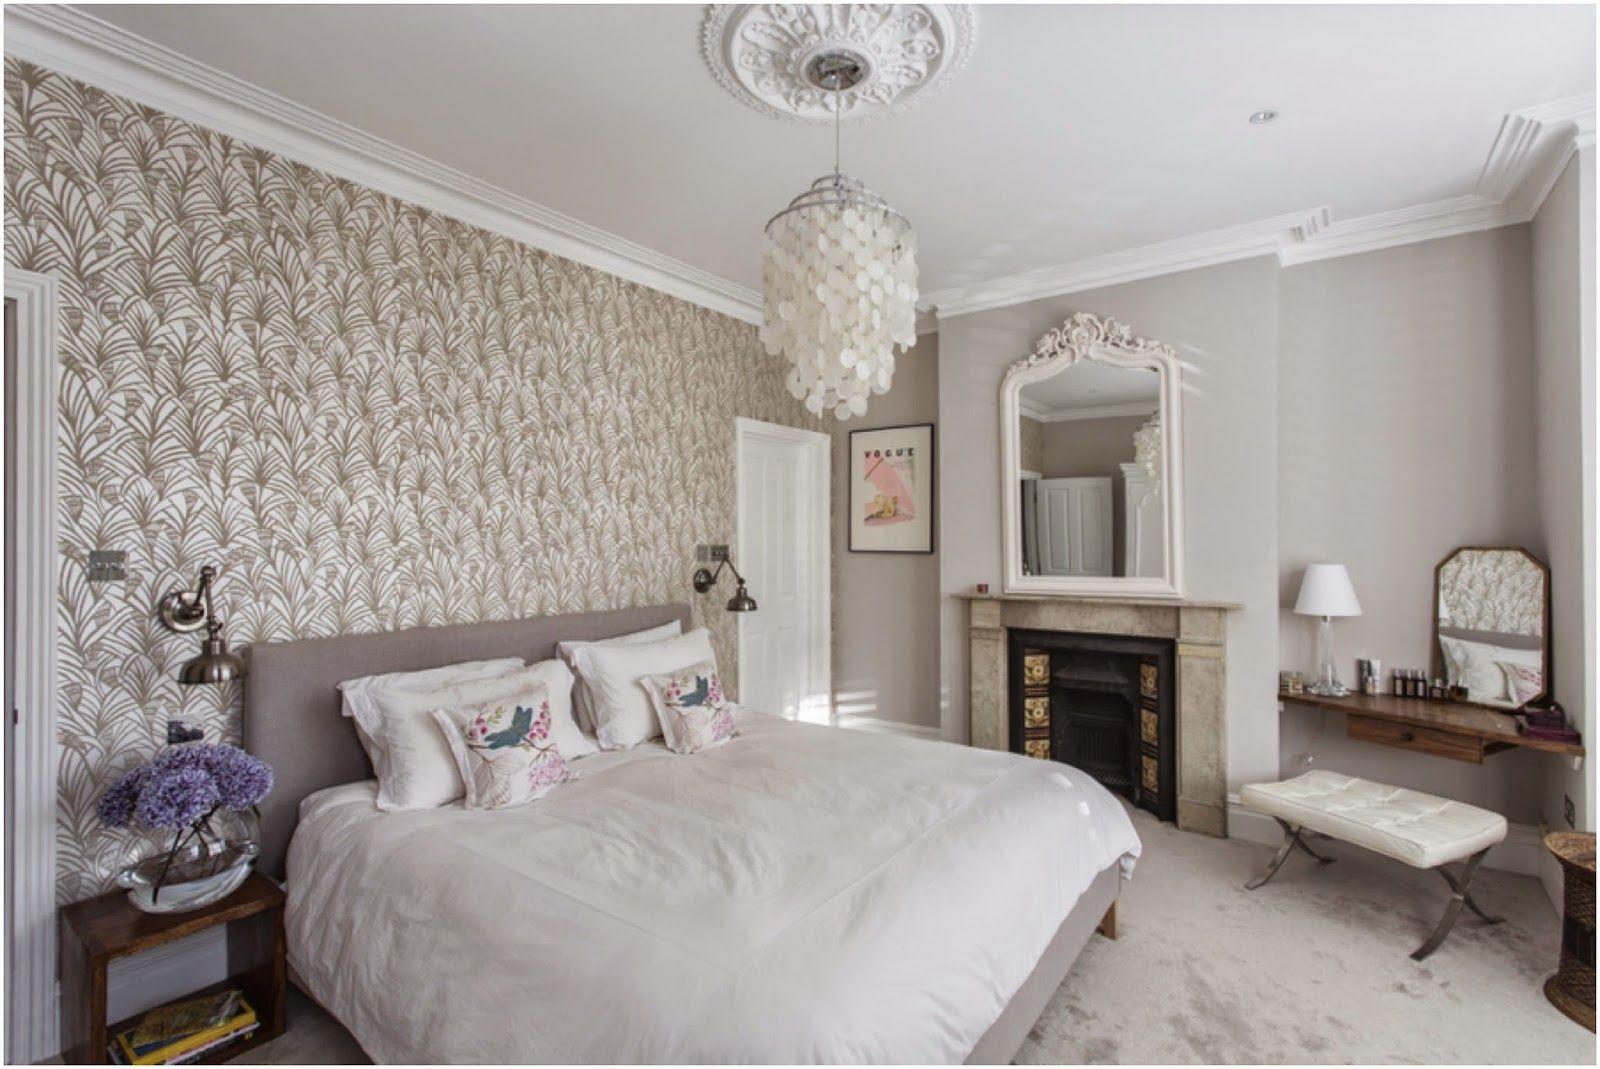 Best Bedroom Complete Farrow Ball Cornforth White Walls 400 x 300